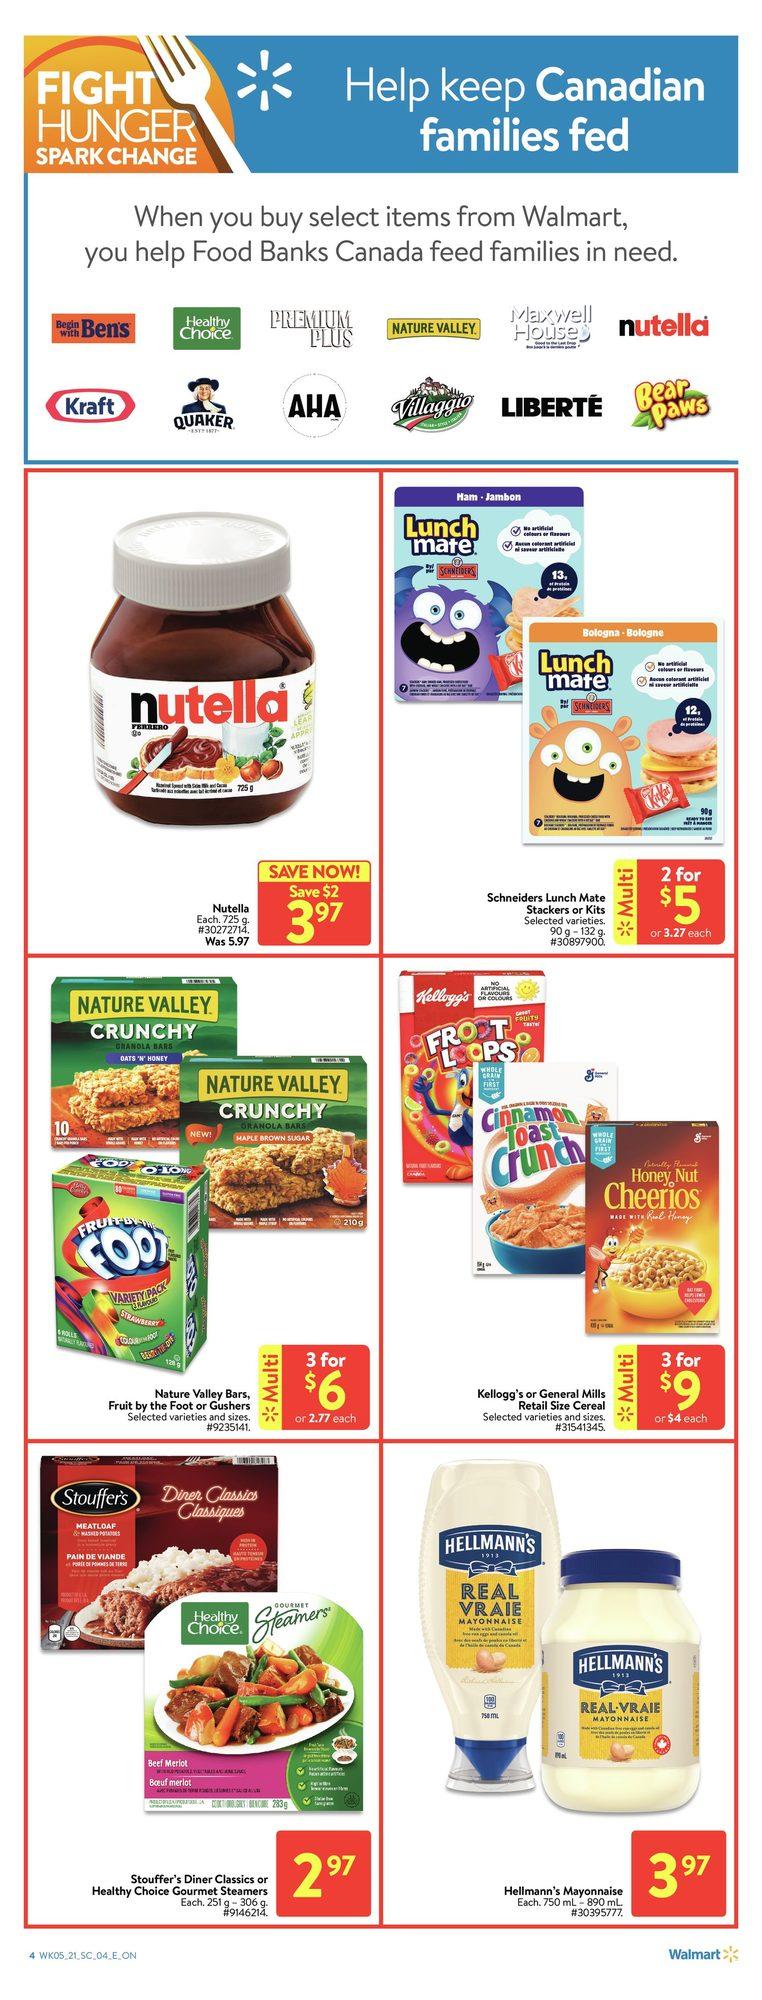 Walmart - Weekly Flyer Specials - Page 9